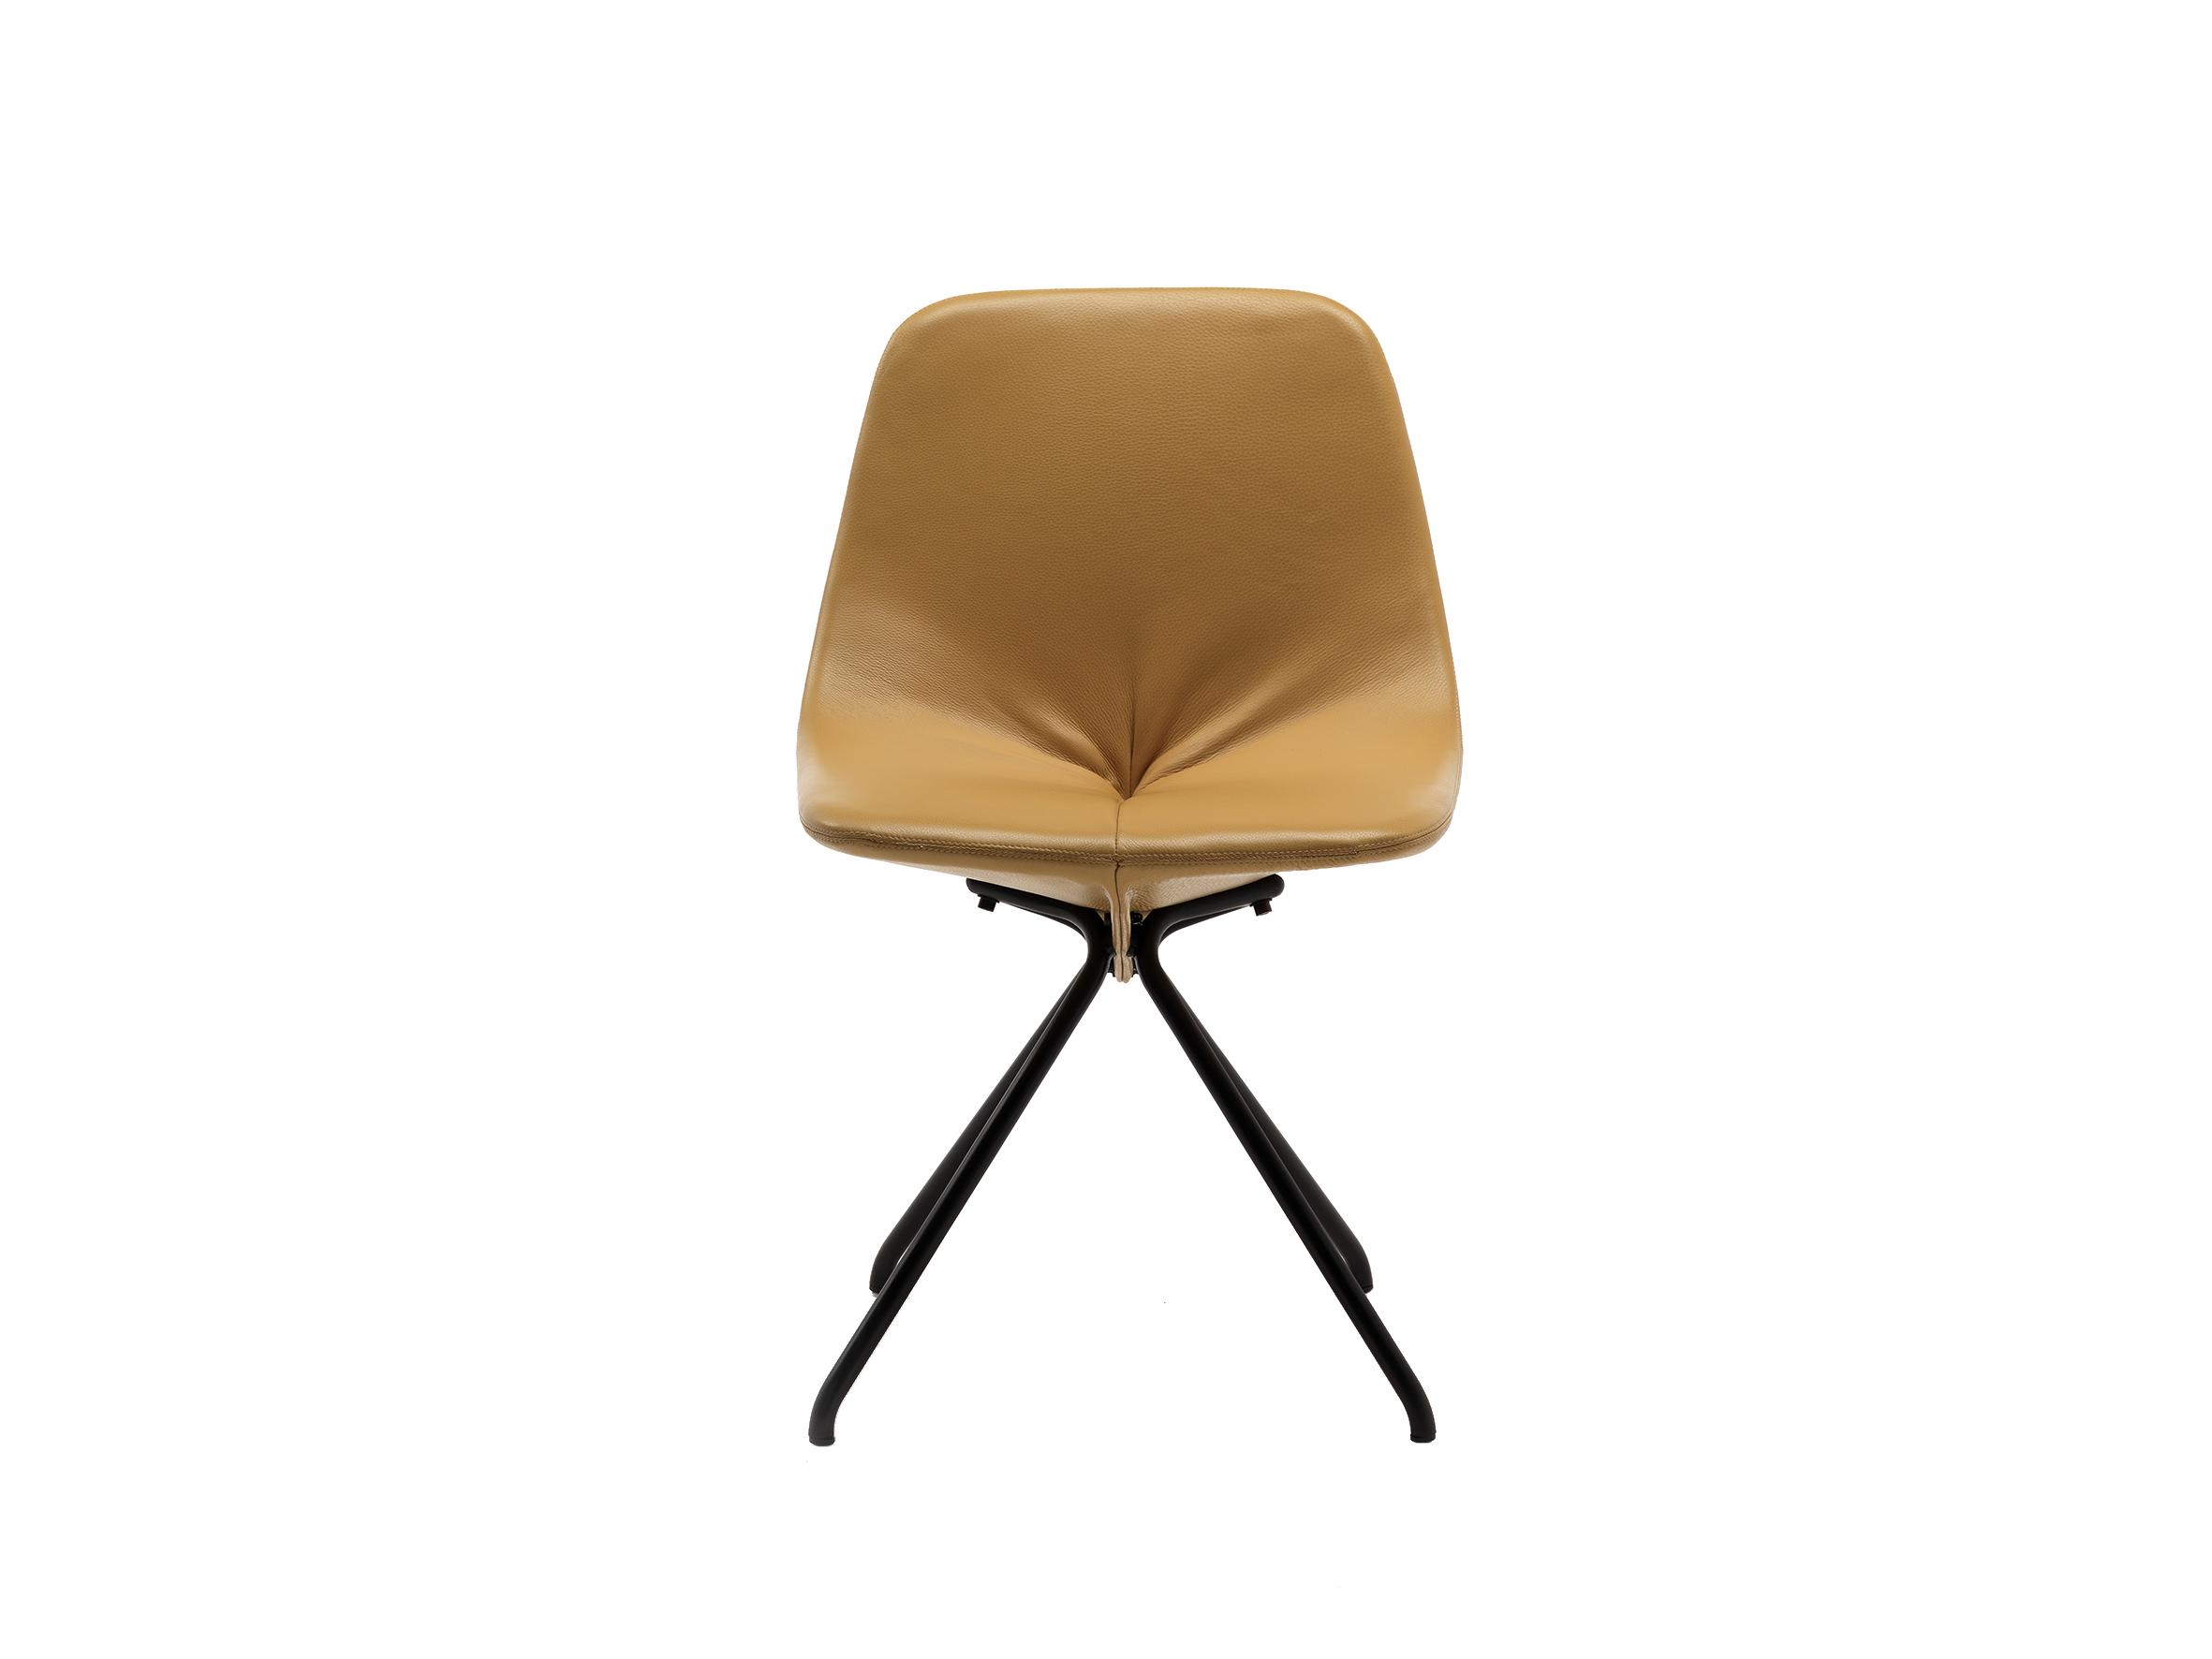 Gastore Rinaldi's classic 1953 'DU30'chair. Now reissued by Poltrona Frau.